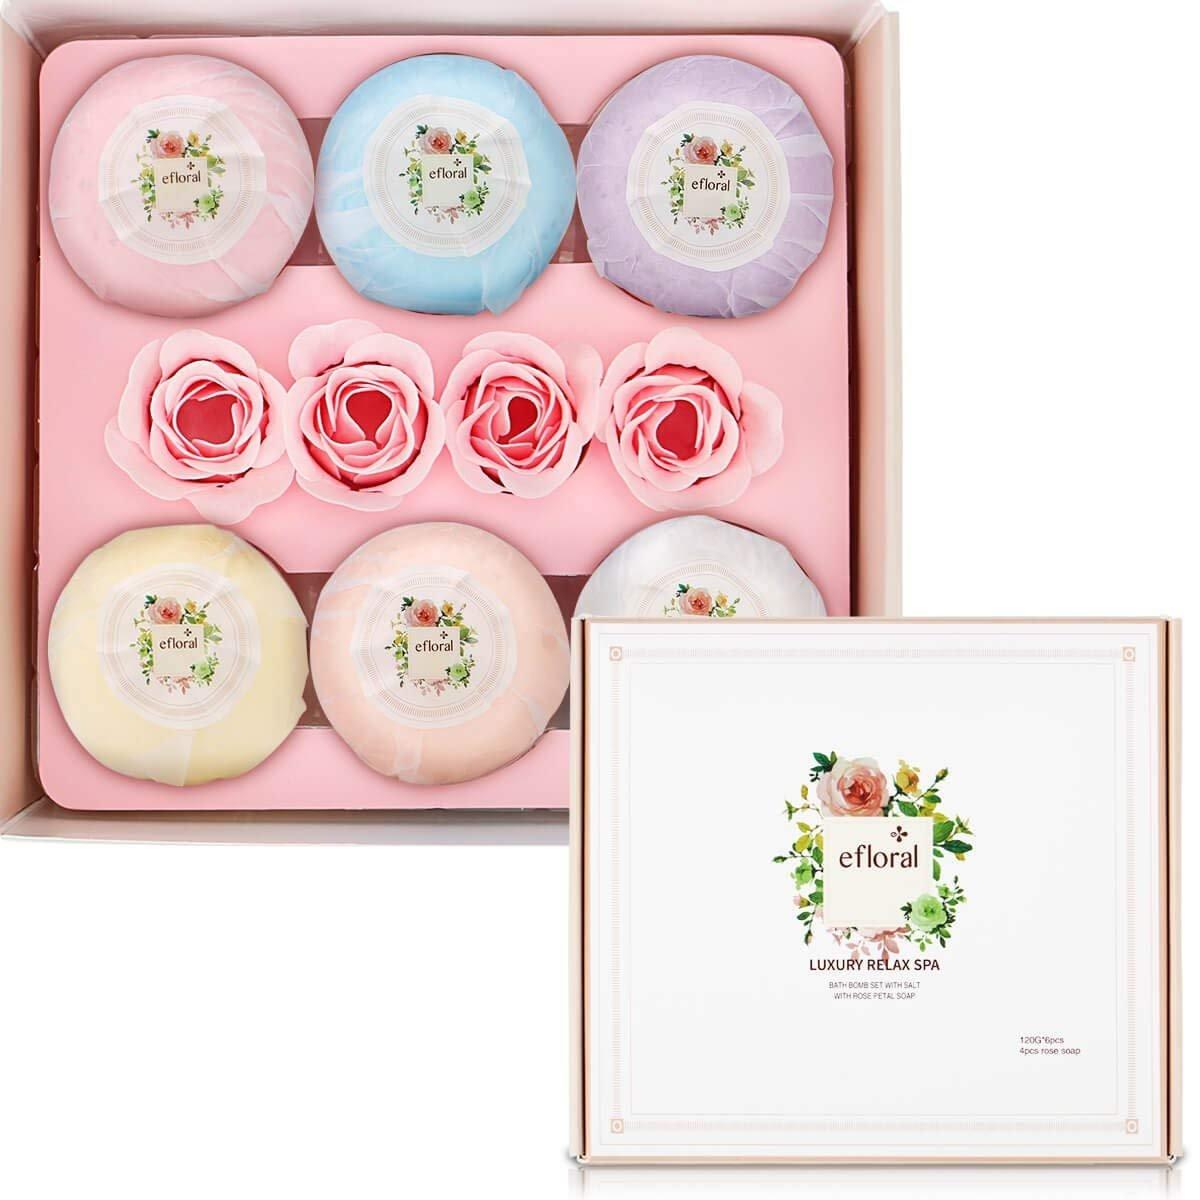 Bath Bombs Gift Set Natural Bath Supplies 6 Pcs Bath Set For Women Fragrance Organic Bath Gift Set 4.2 Oz efloral 7047